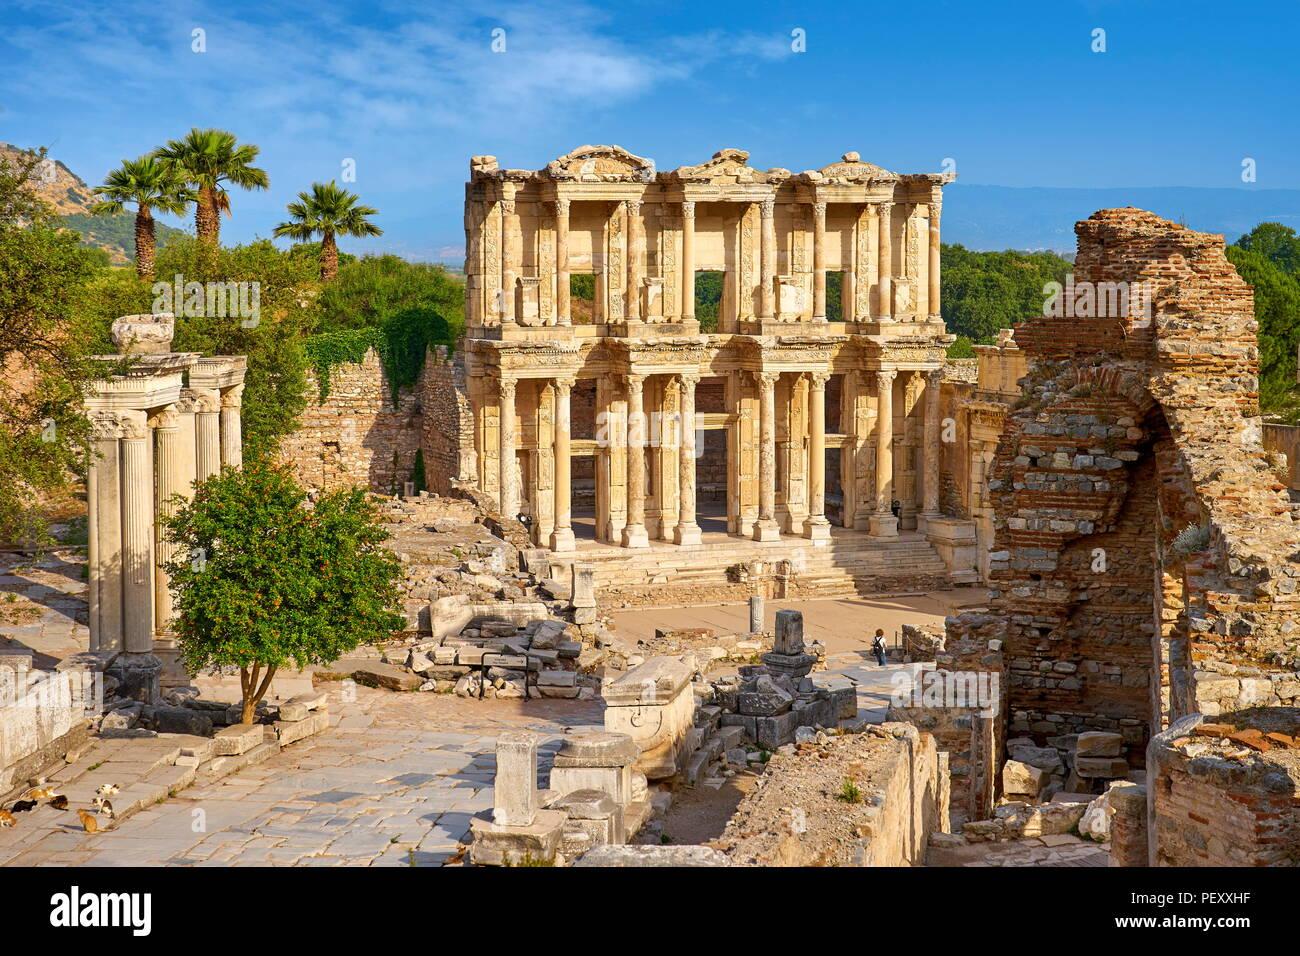 Biblioteca di Celso, Efeso antica città, Izmir, Turchia Immagini Stock